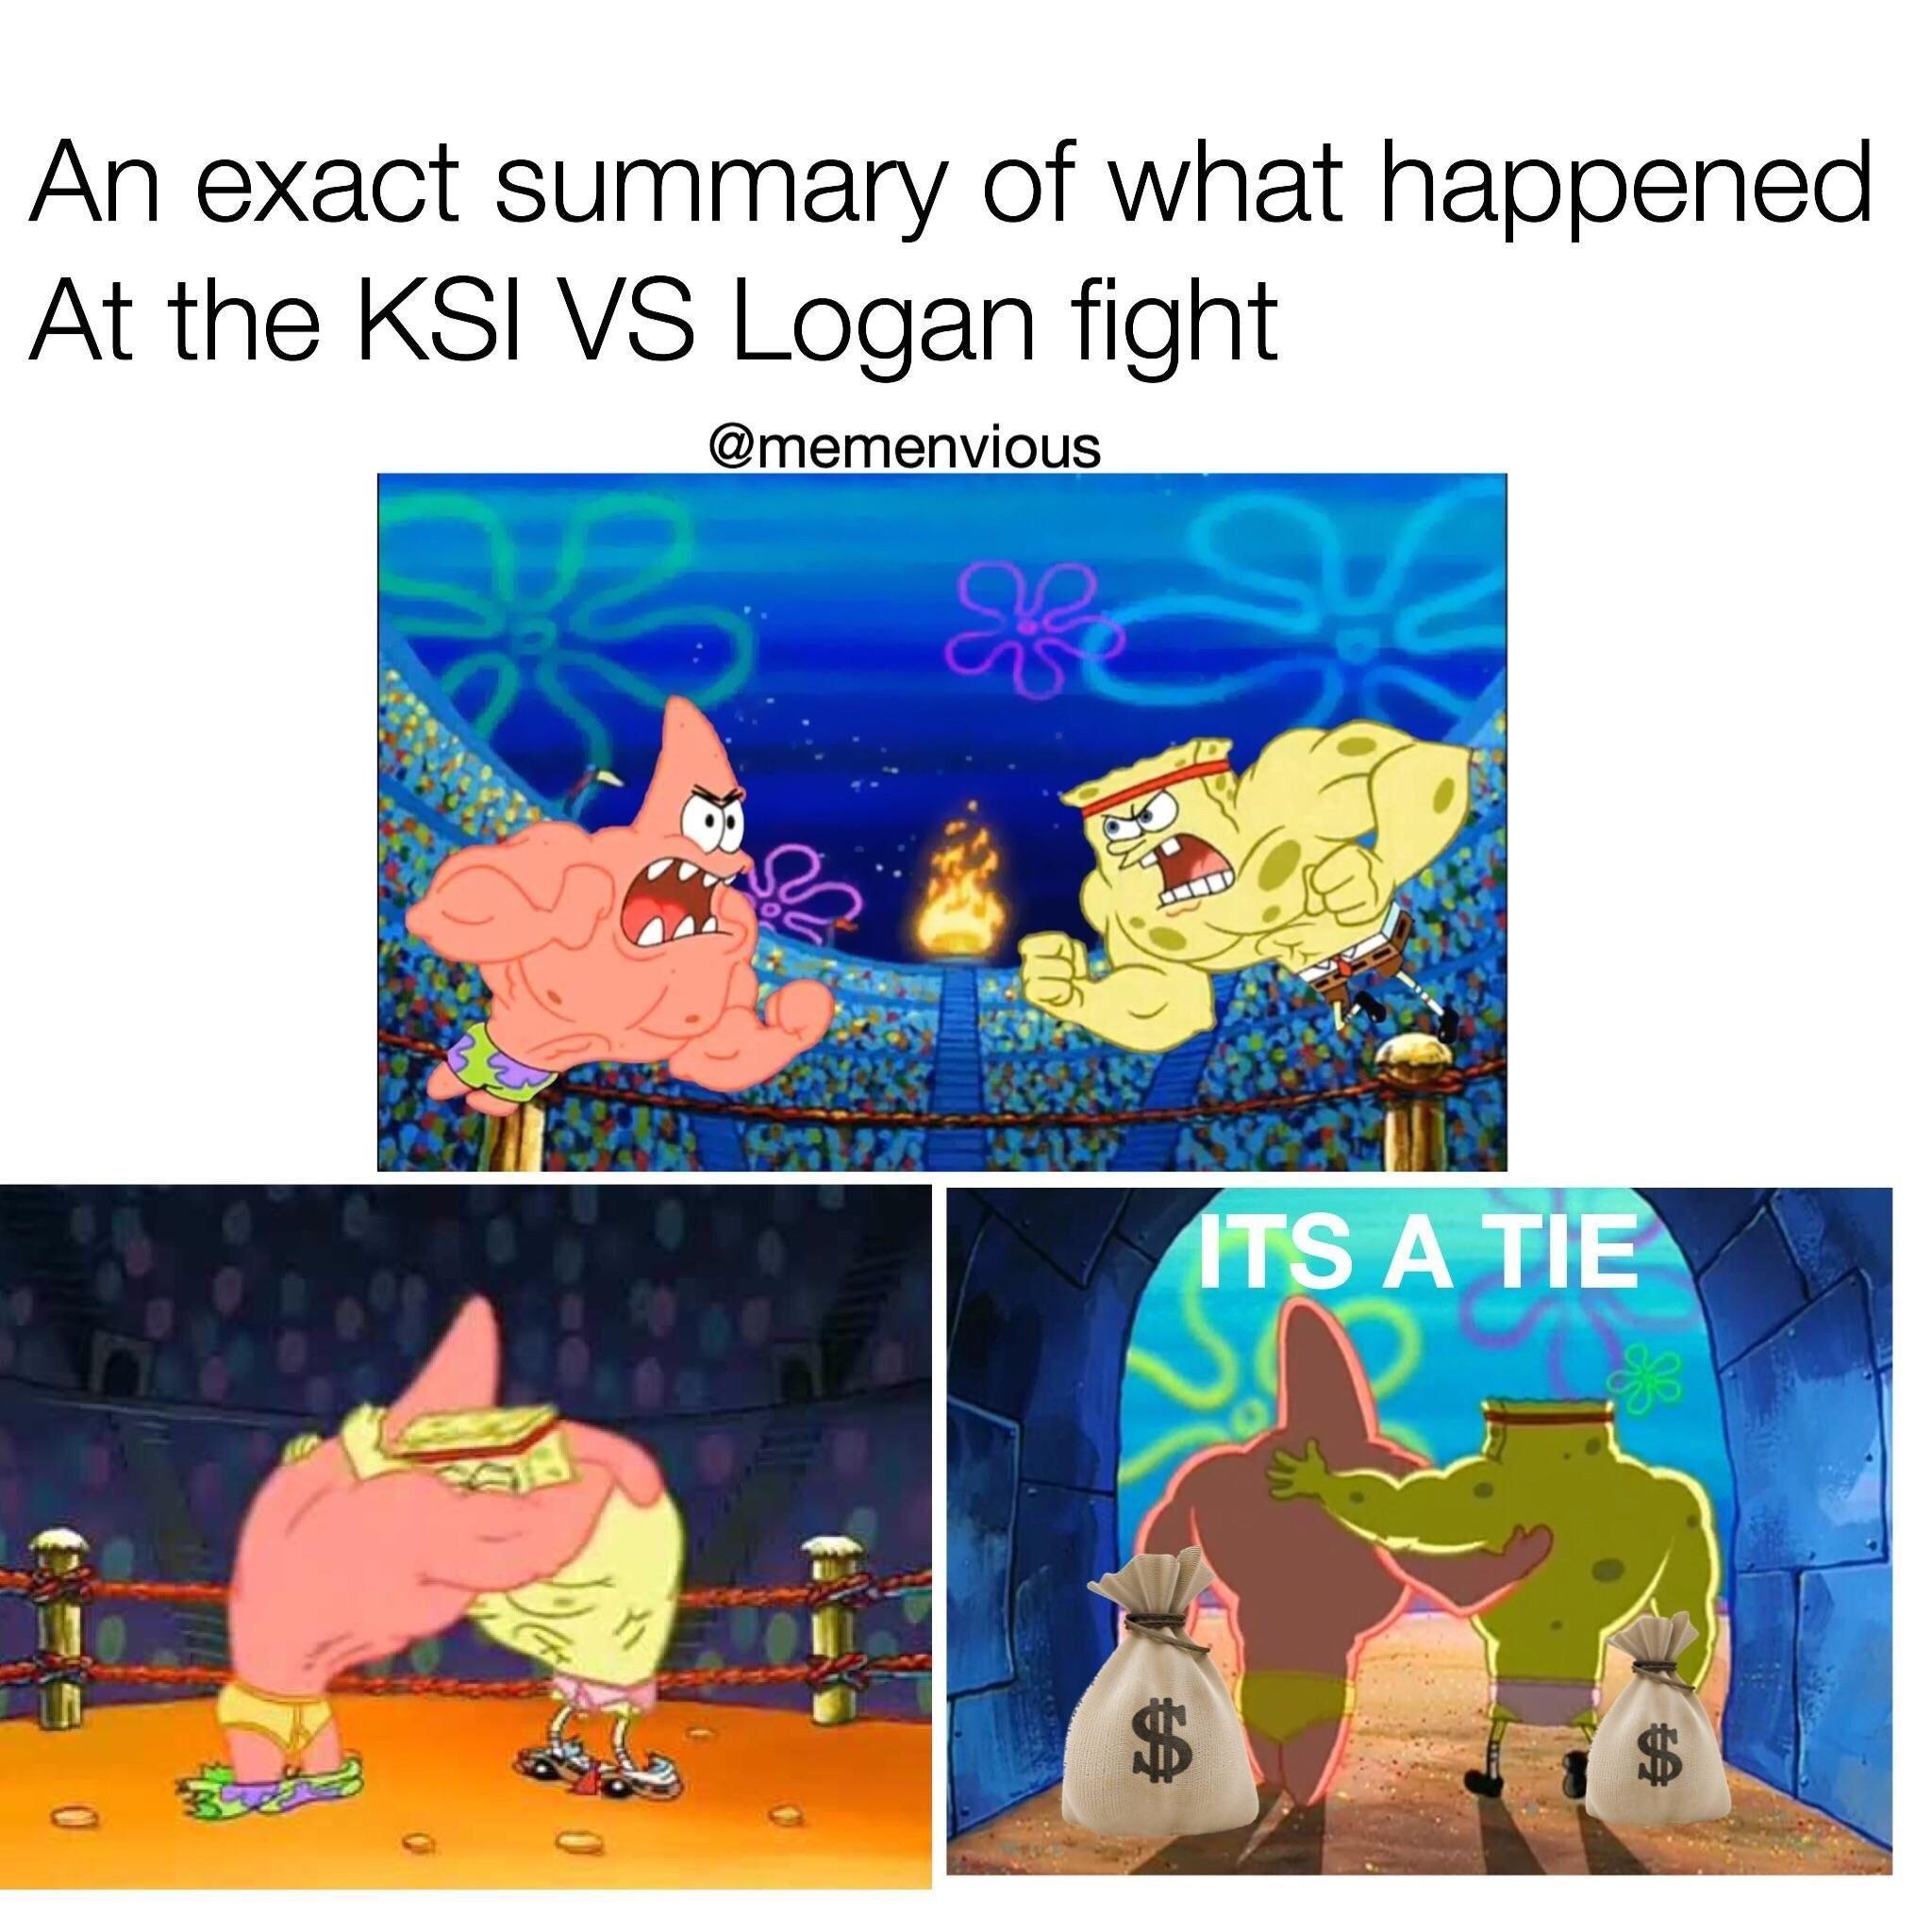 Spongebob predicted the future